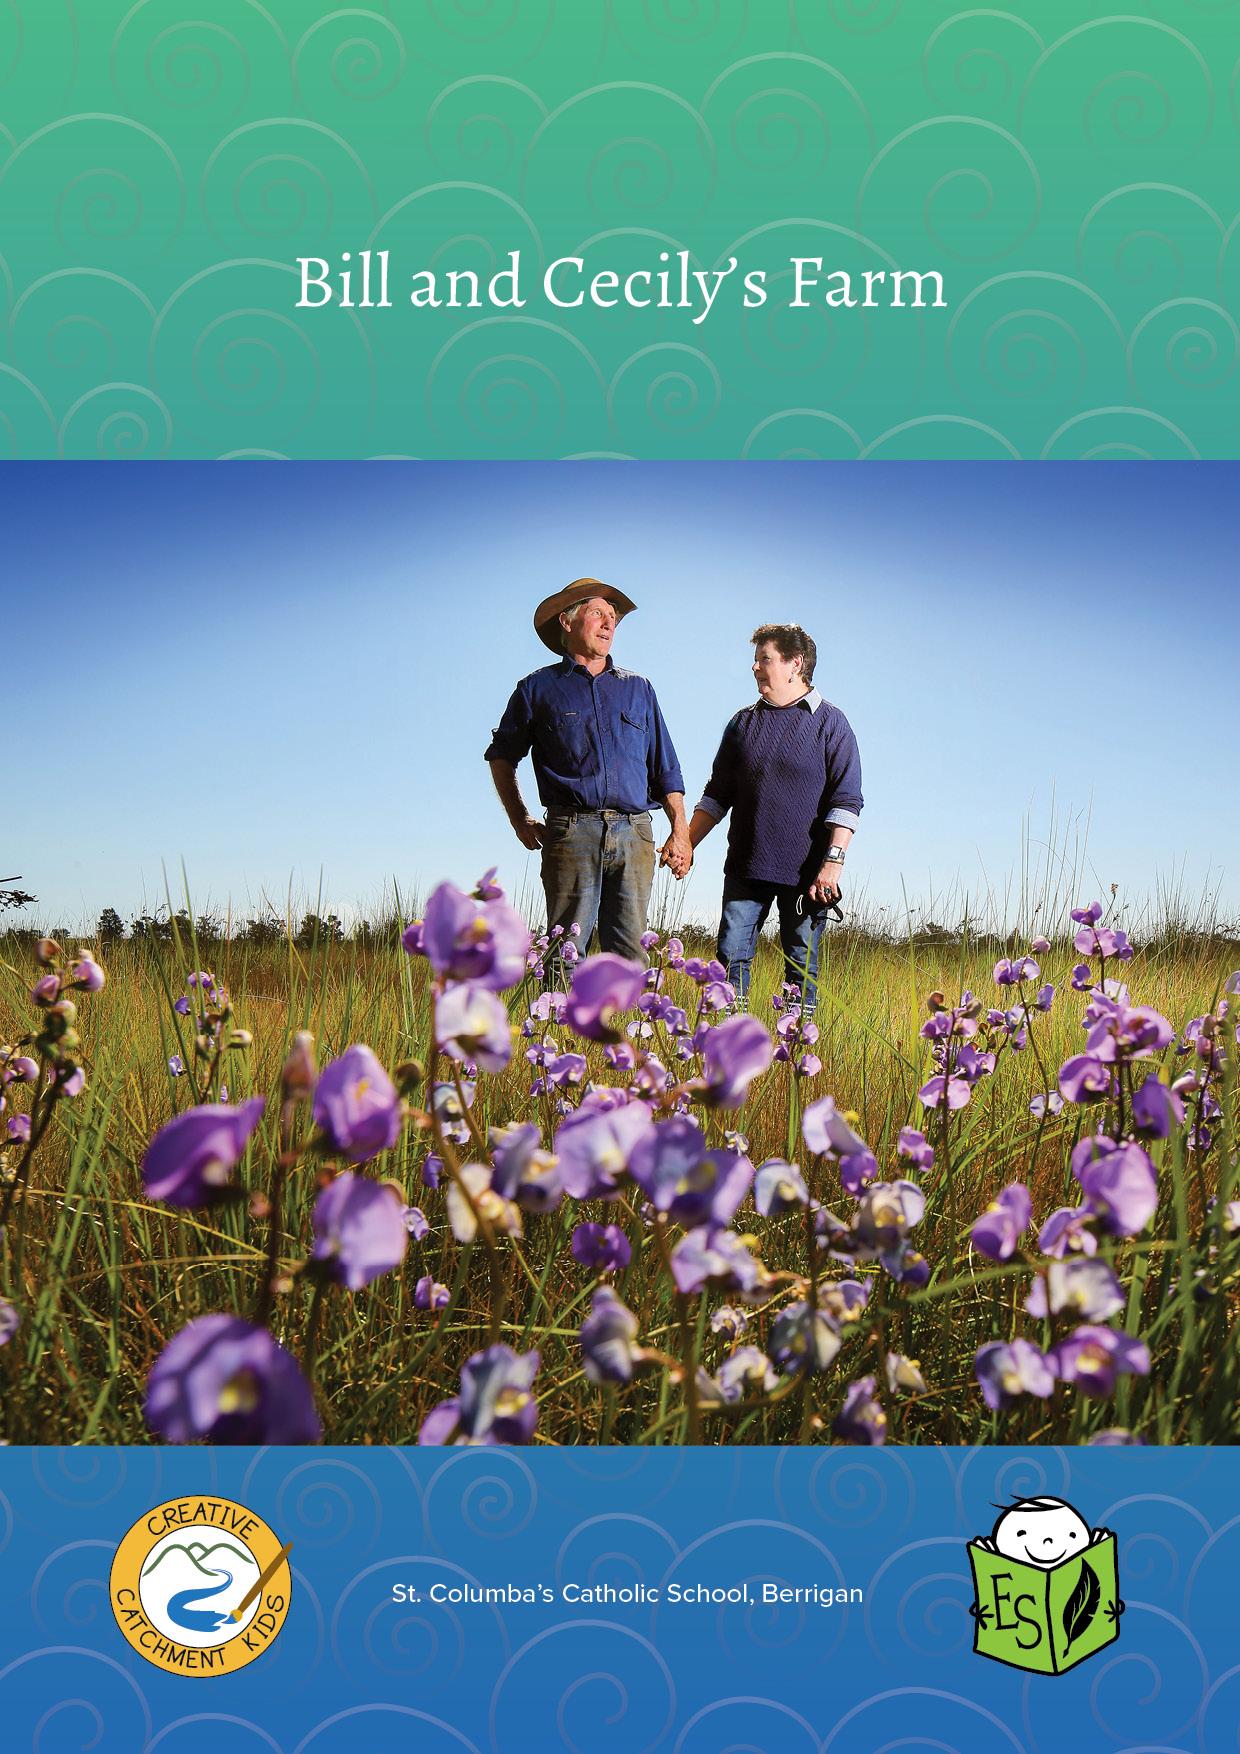 Bill and Cecily's Farm